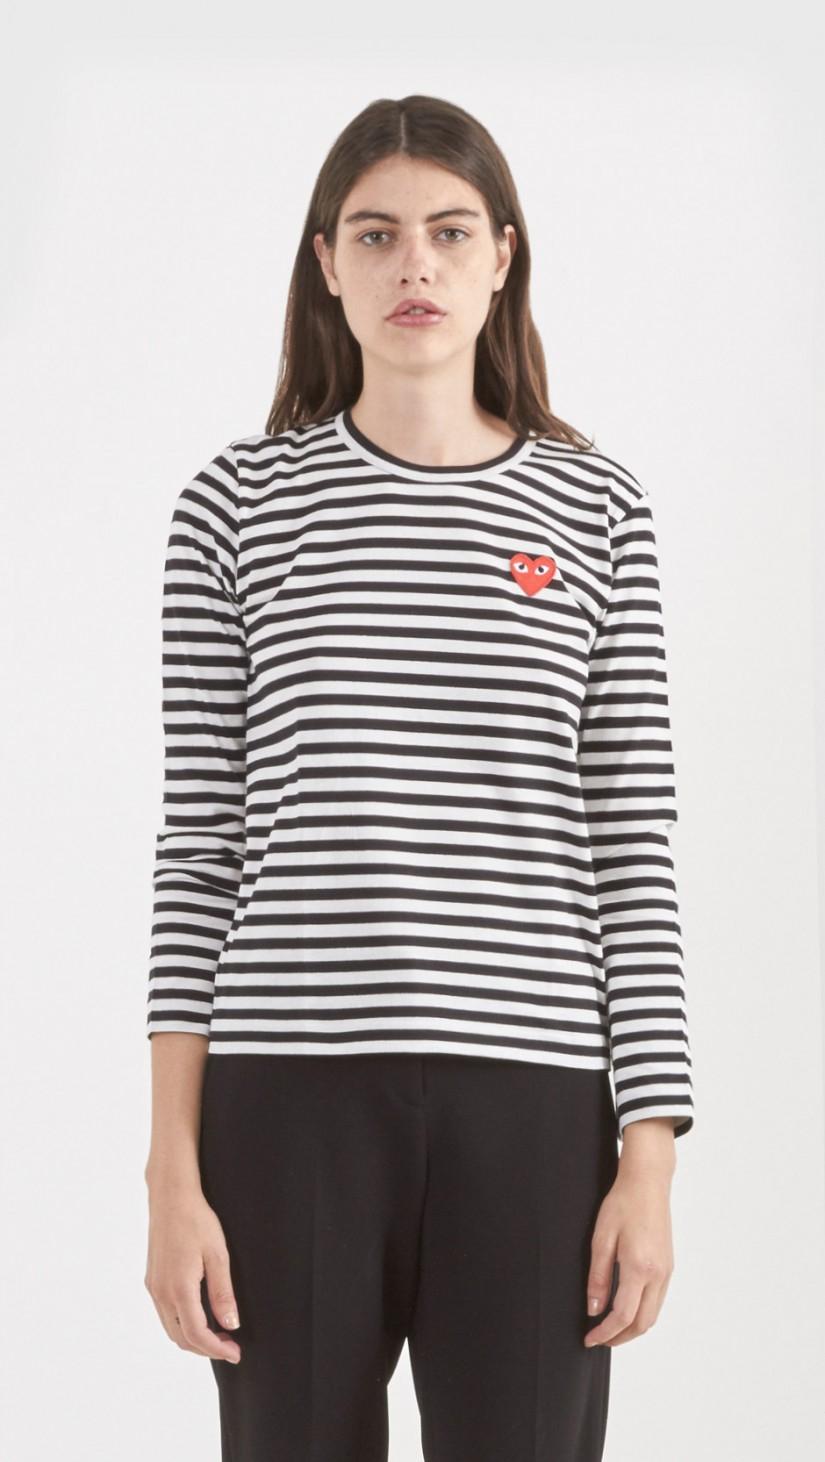 Lyst - Play Comme des Garçons Striped T-shirt in Black 009dd1818